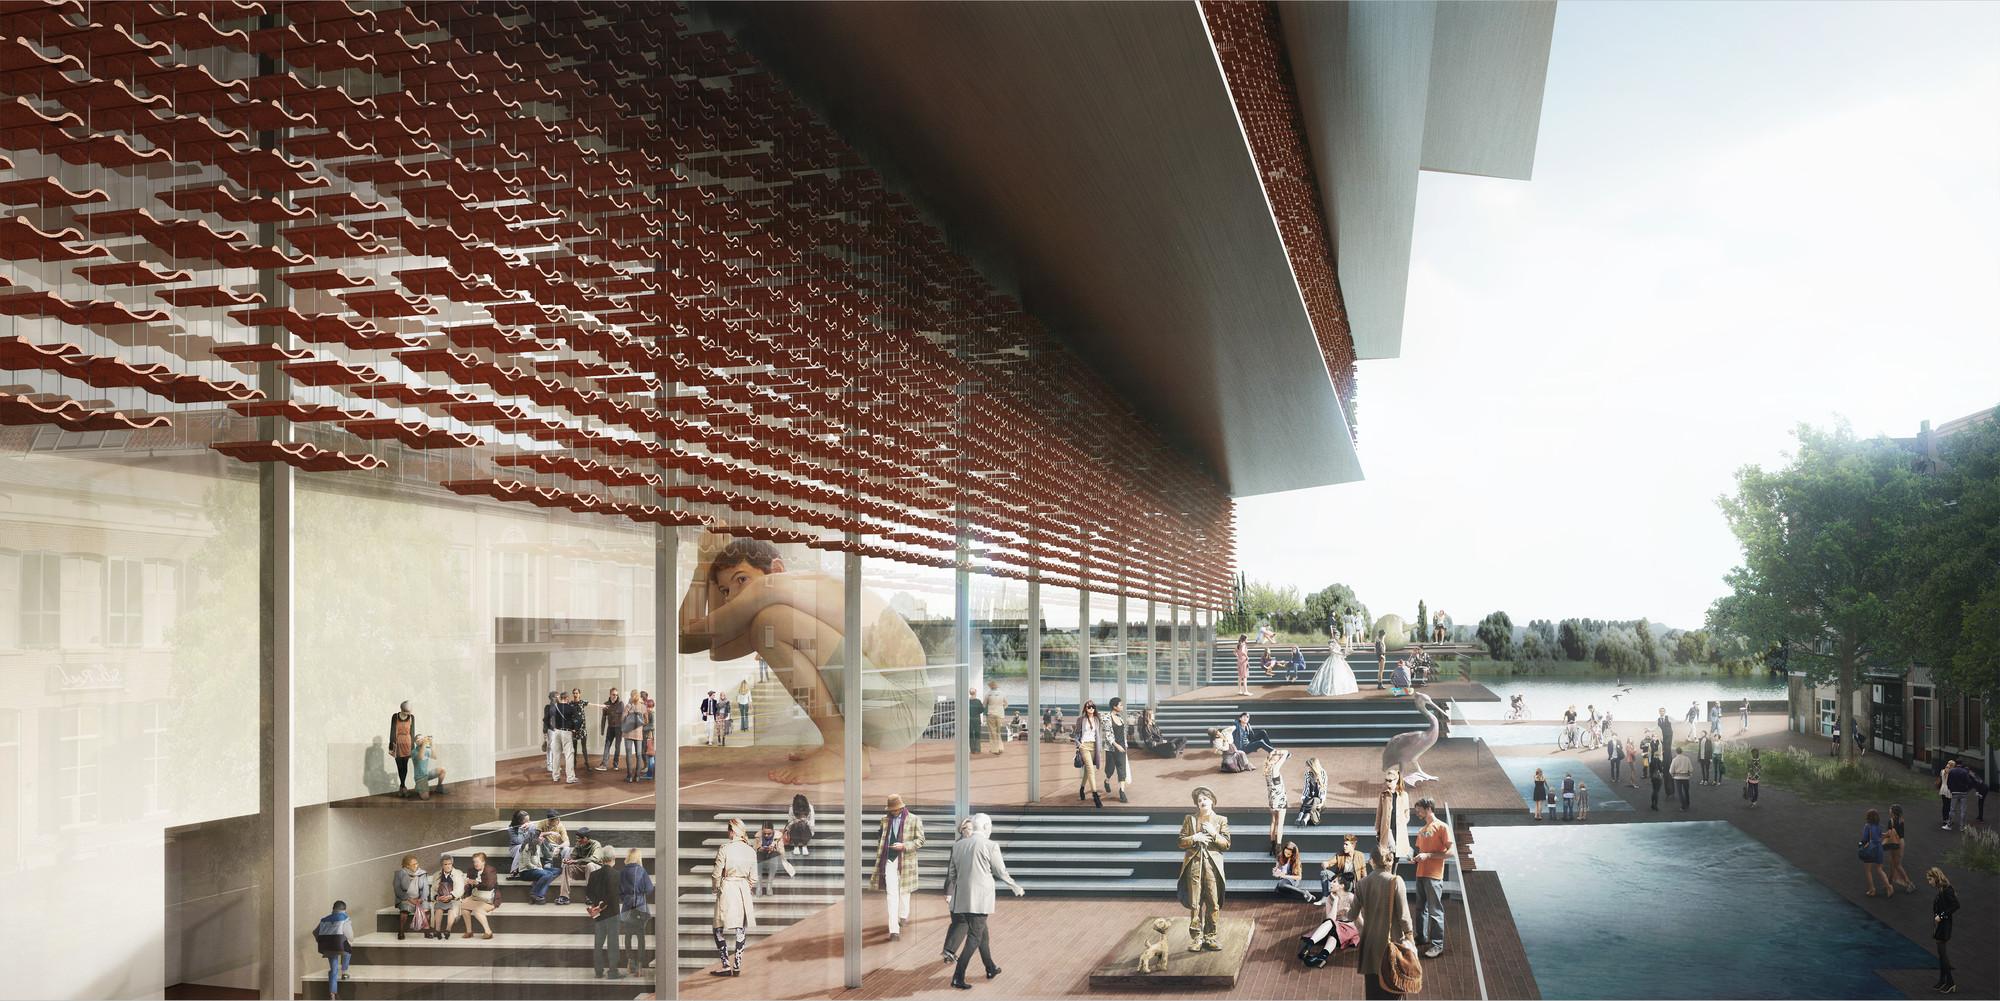 Kengo Kuma Presents Shortlisted Design For Arta Quot Civic